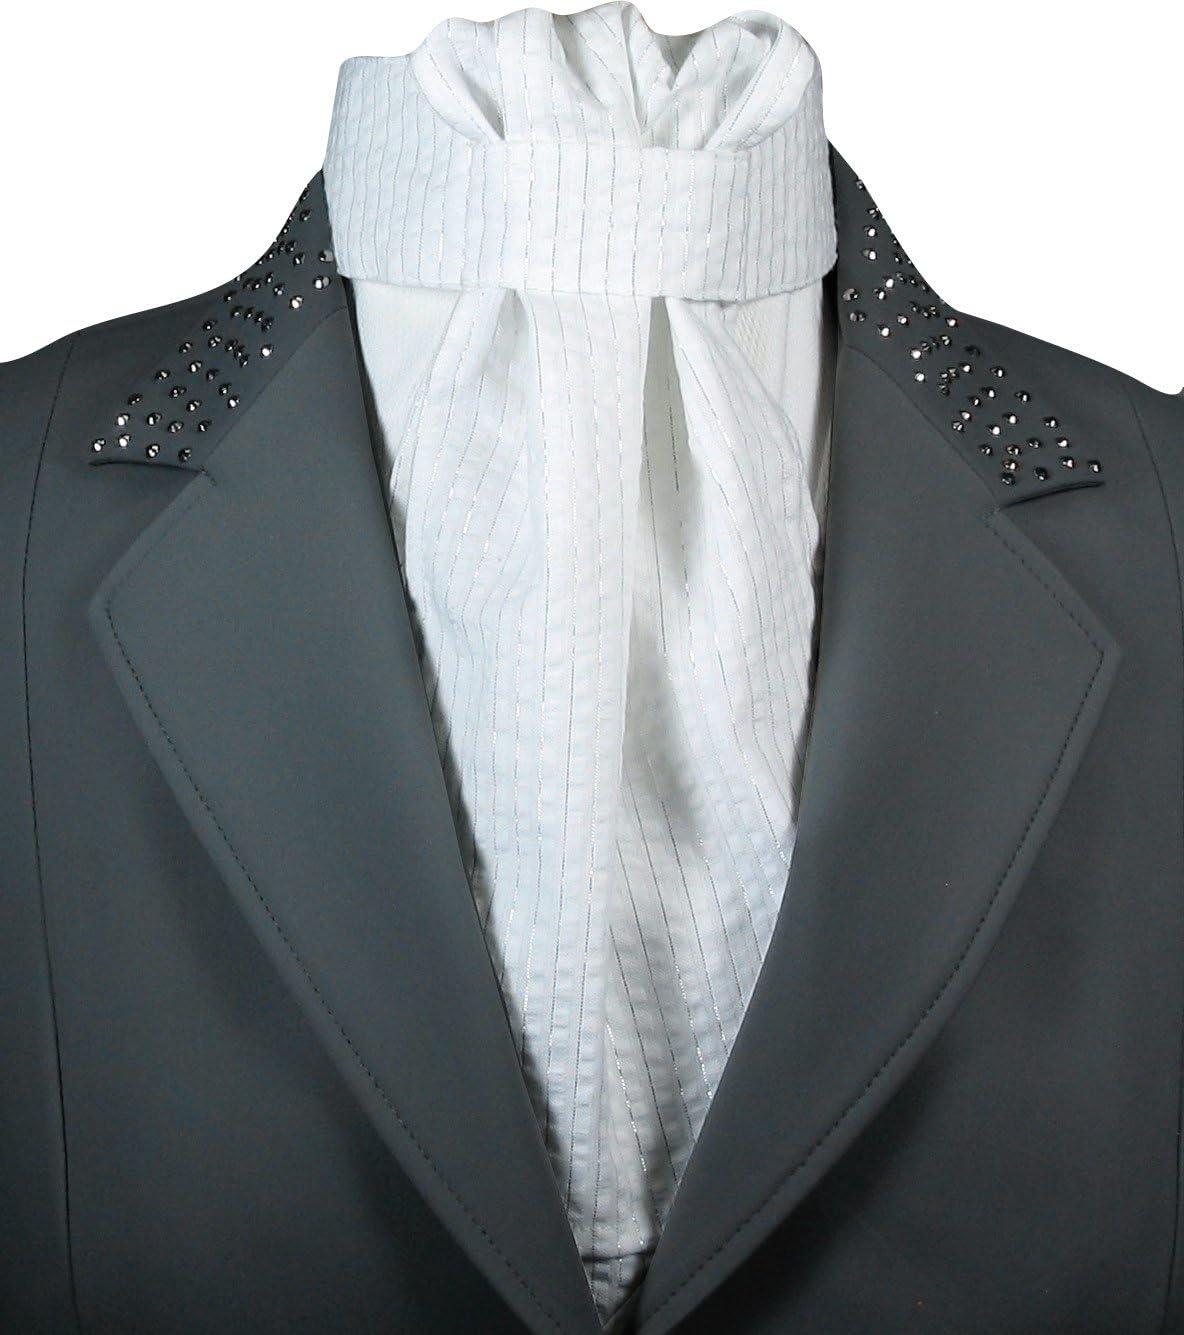 Equi LogicシルバースレッドStock Tie ホワイト/シルバー